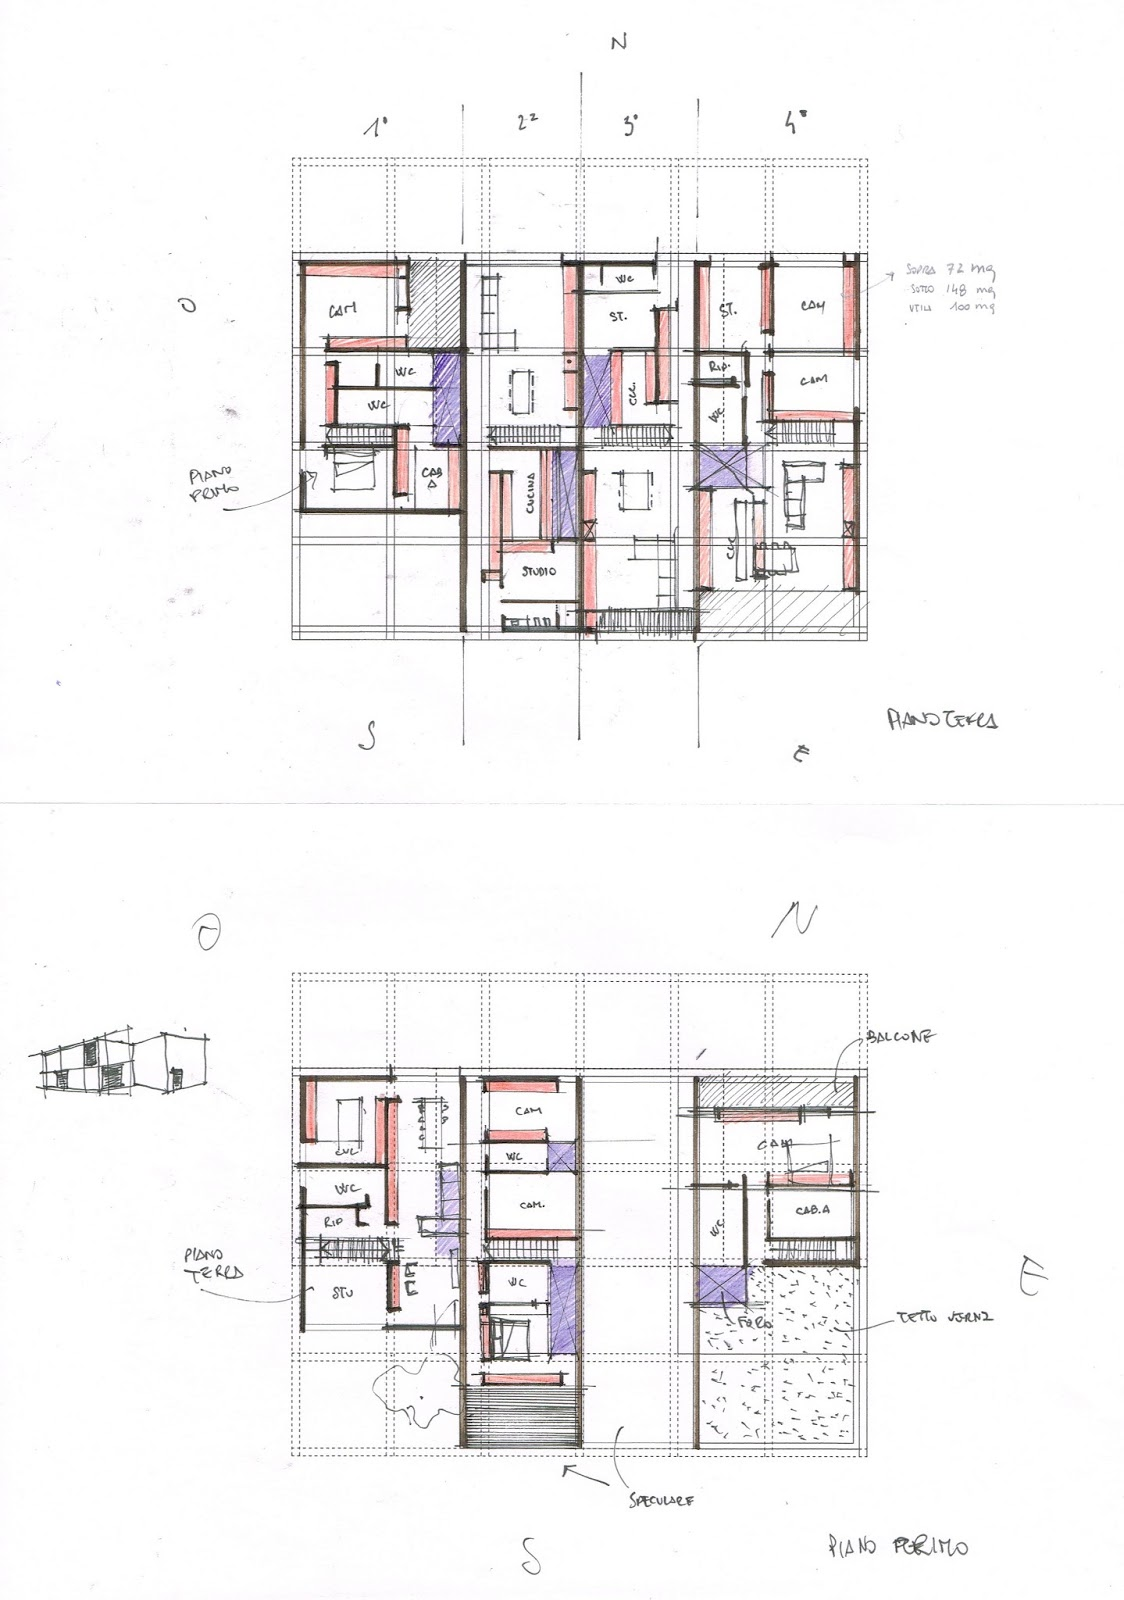 Planimetria plan studio di architettura a verona case for Planimetrie casa gratis